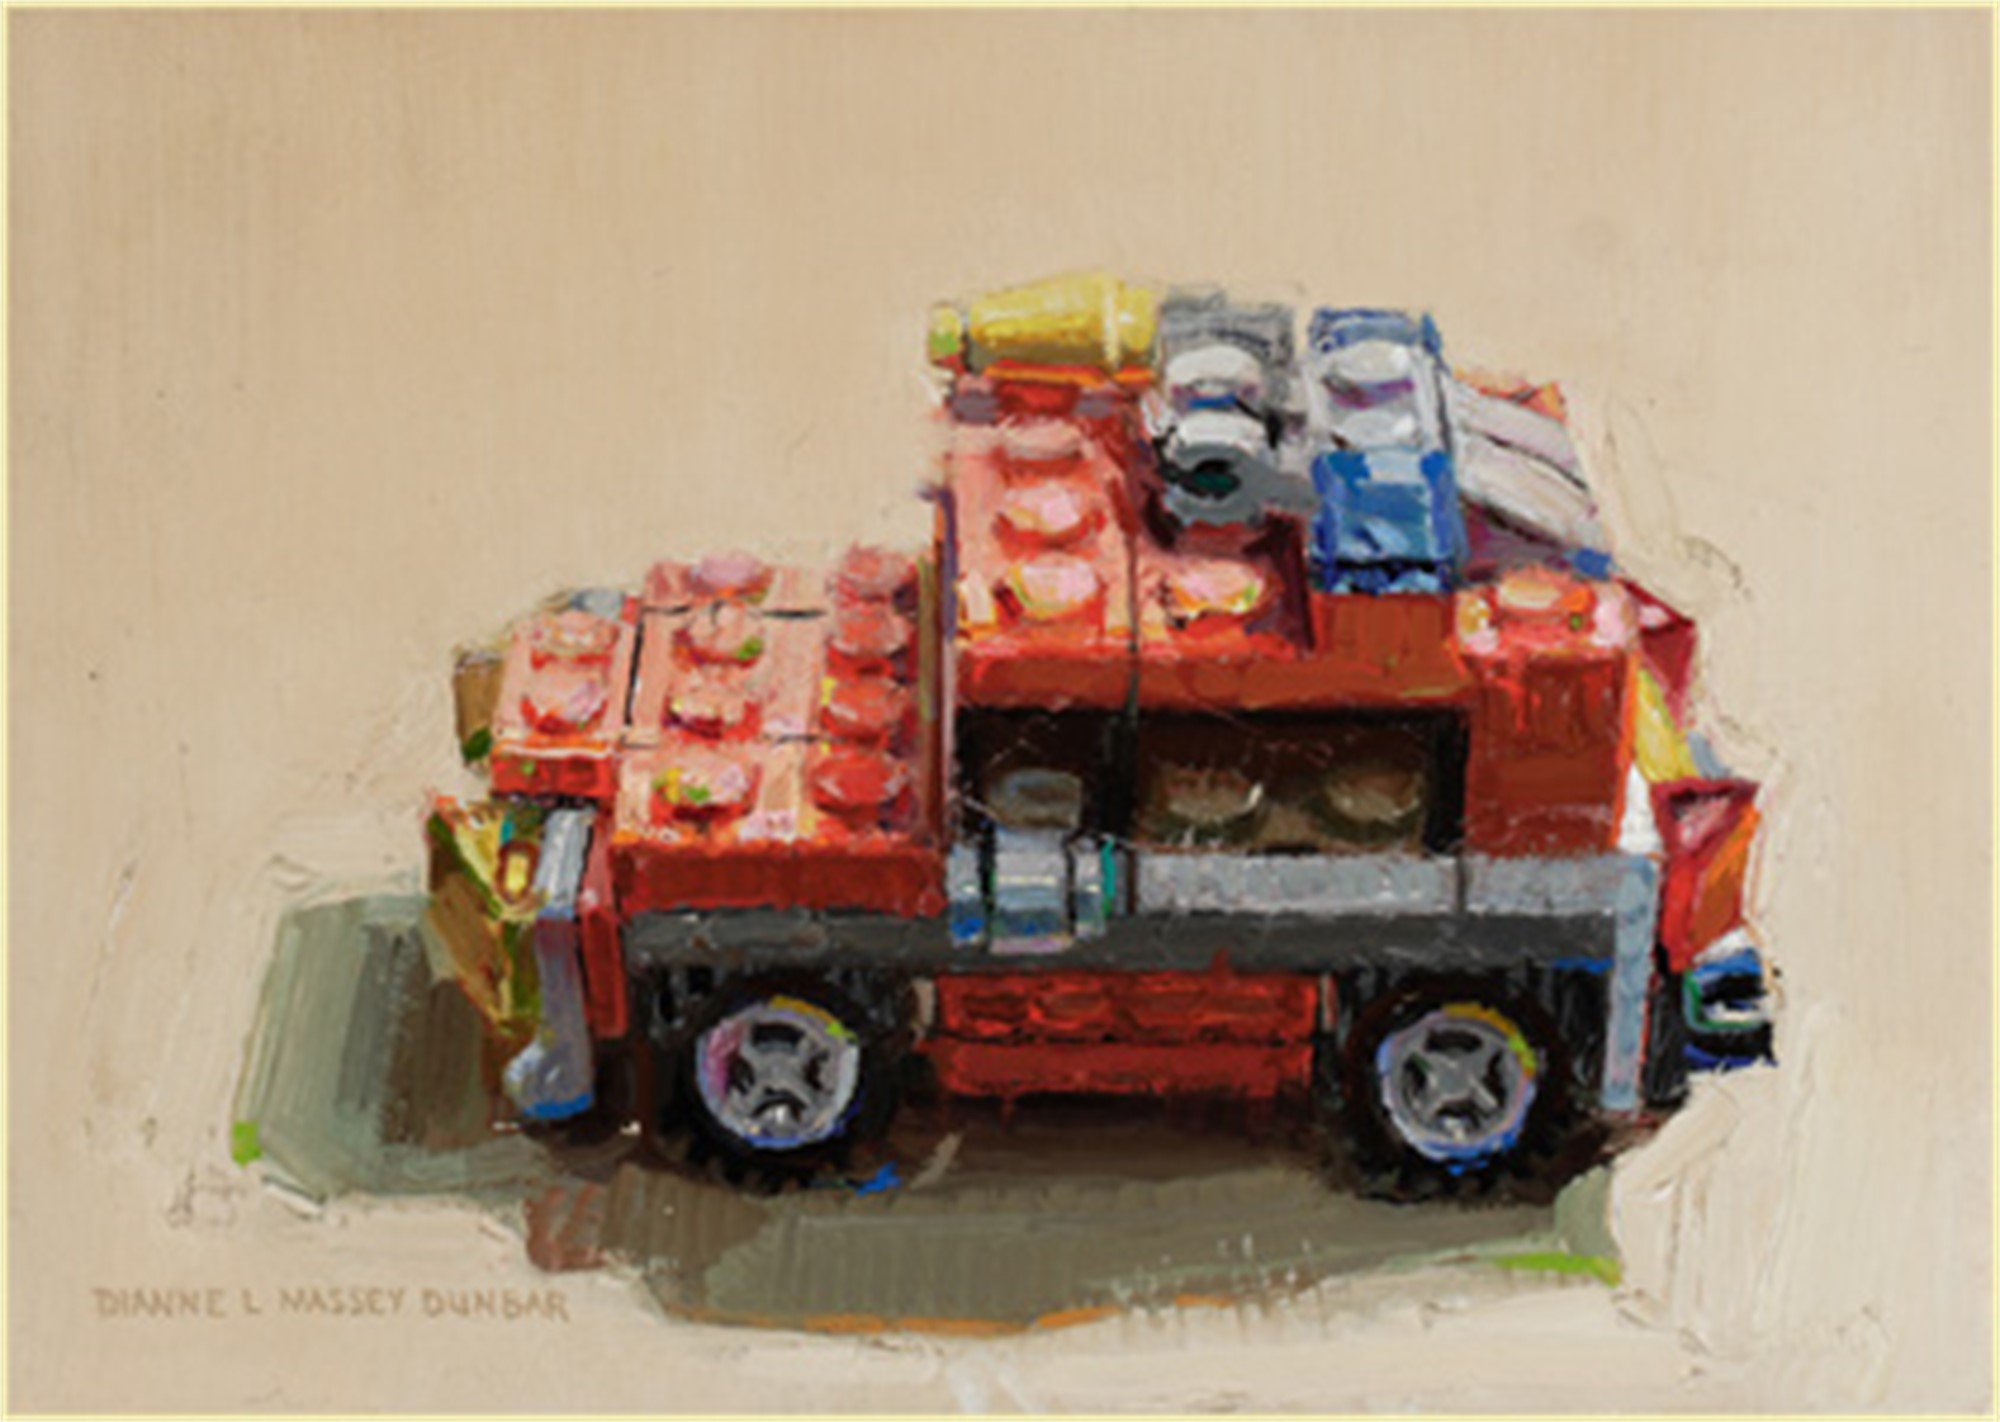 Jeep by Dianne L Massey Dunbar